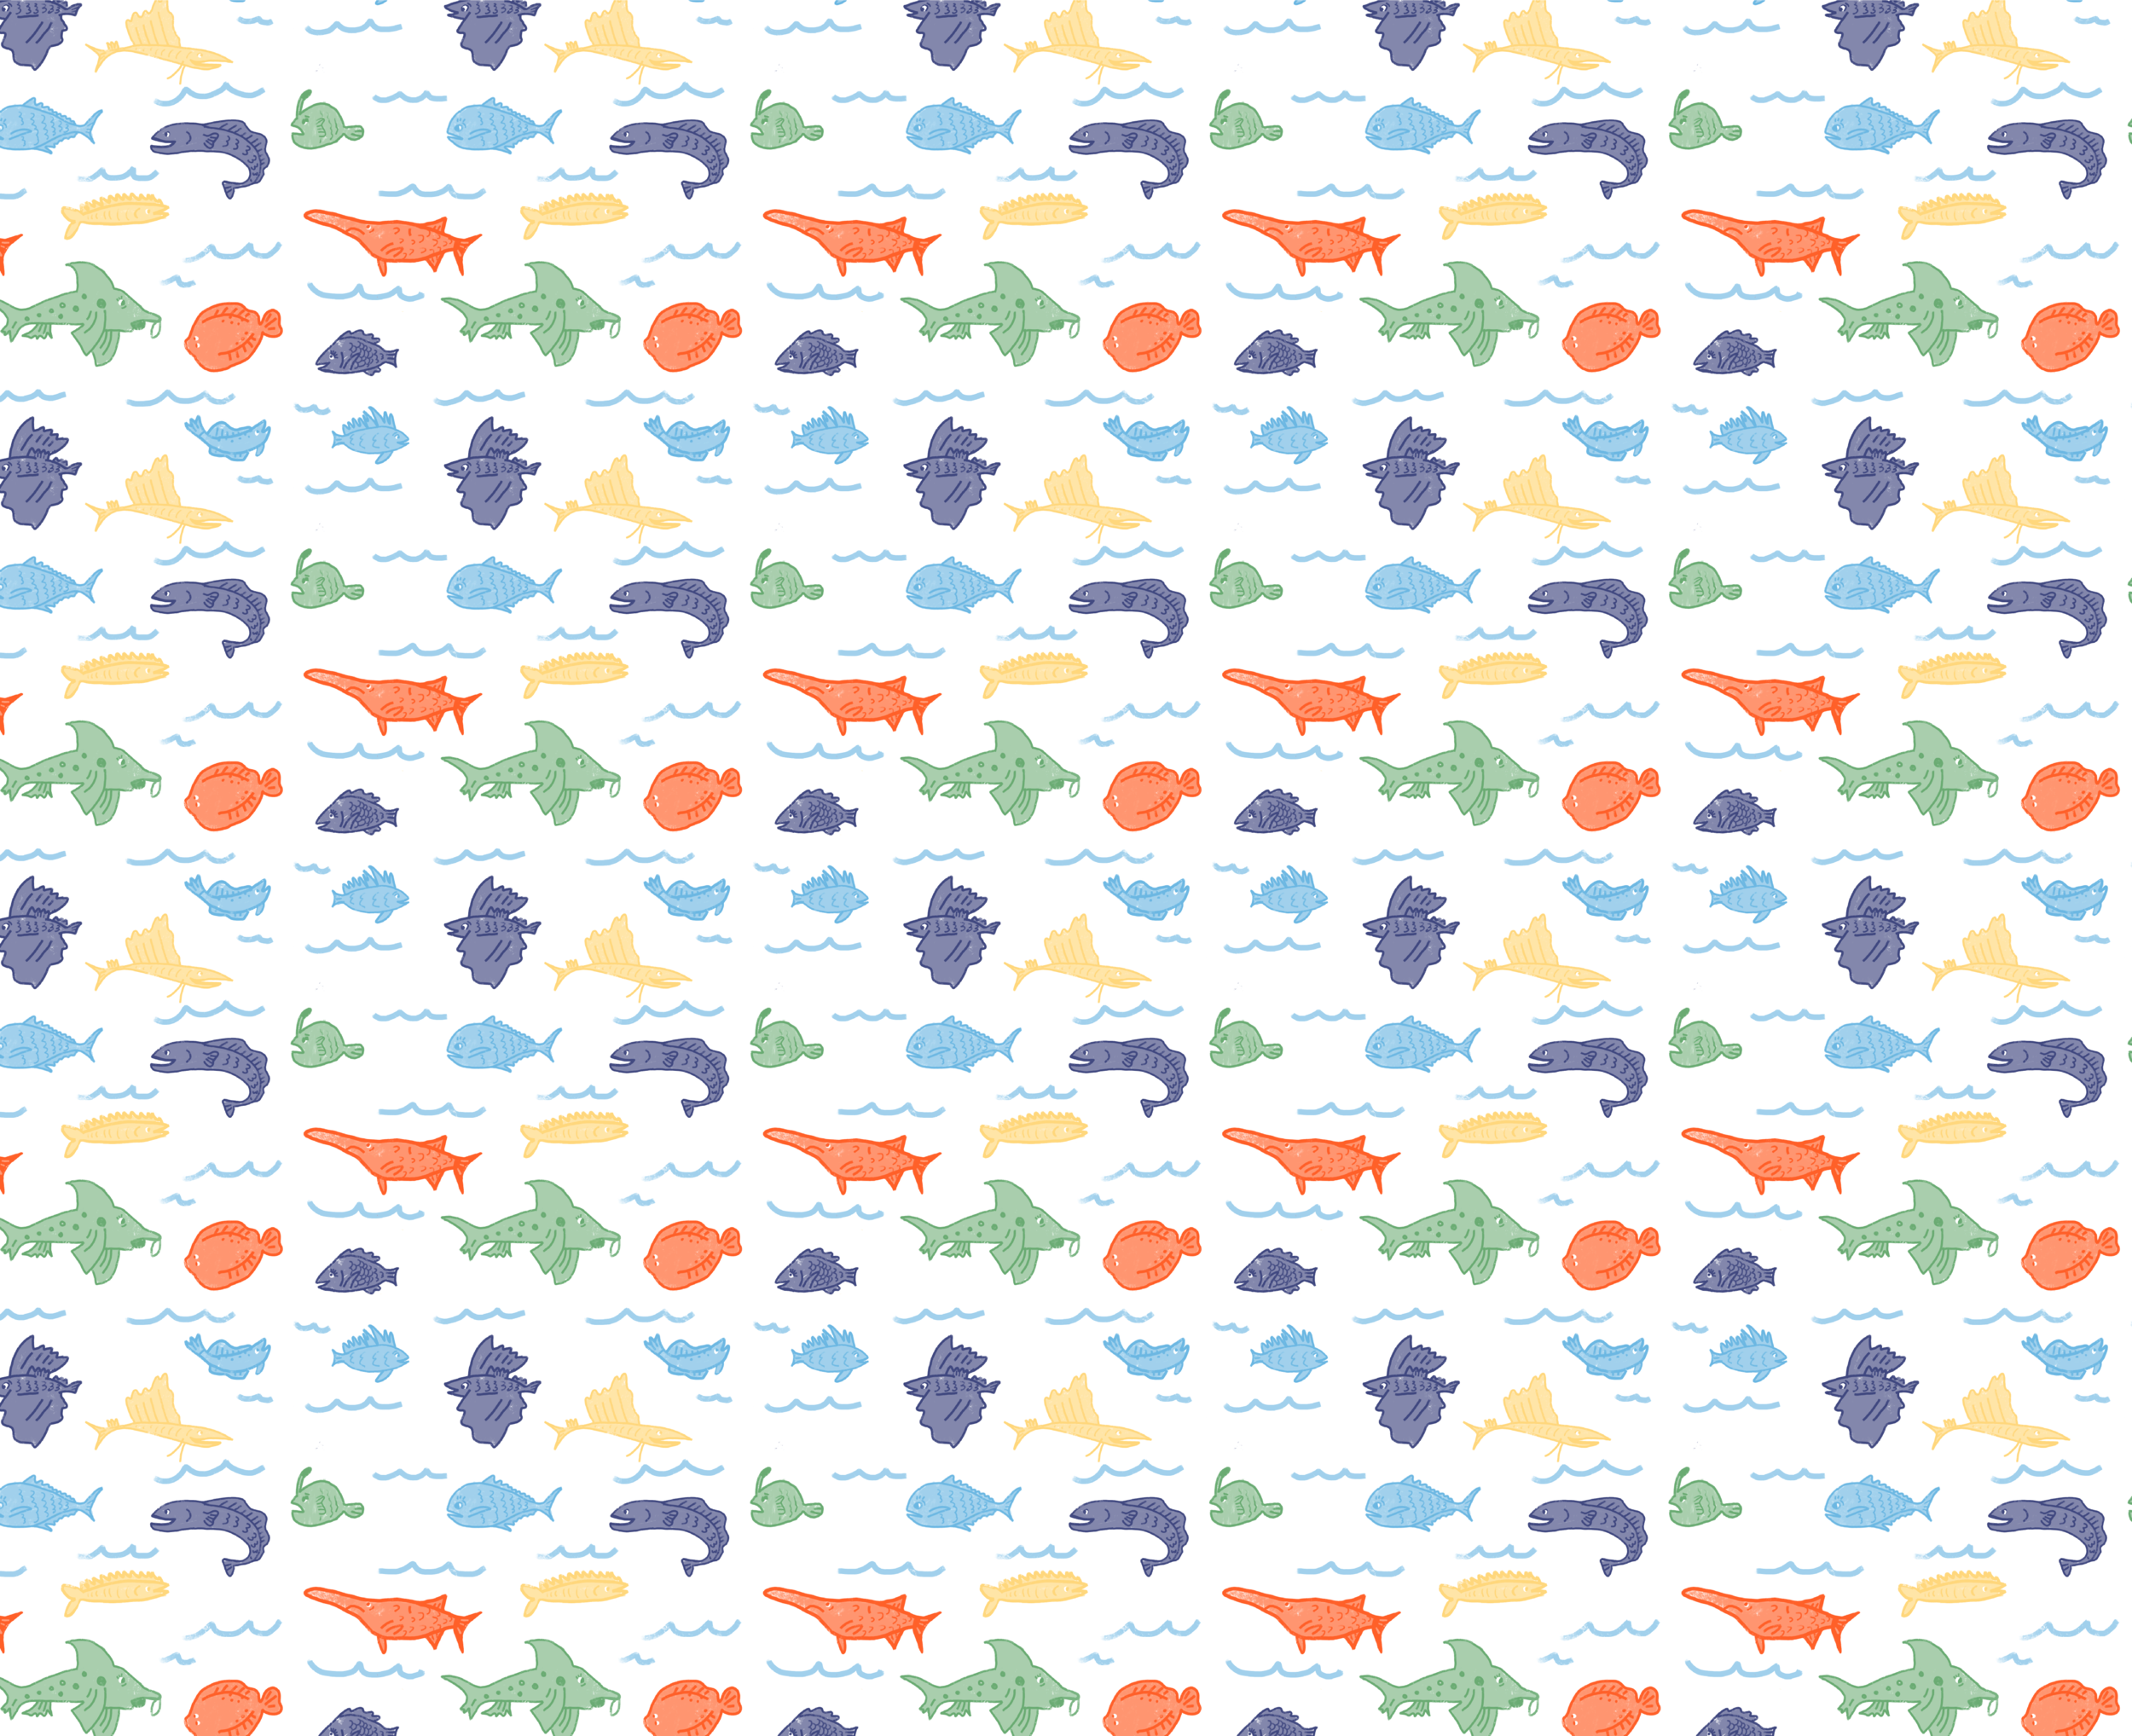 fishpattern.png